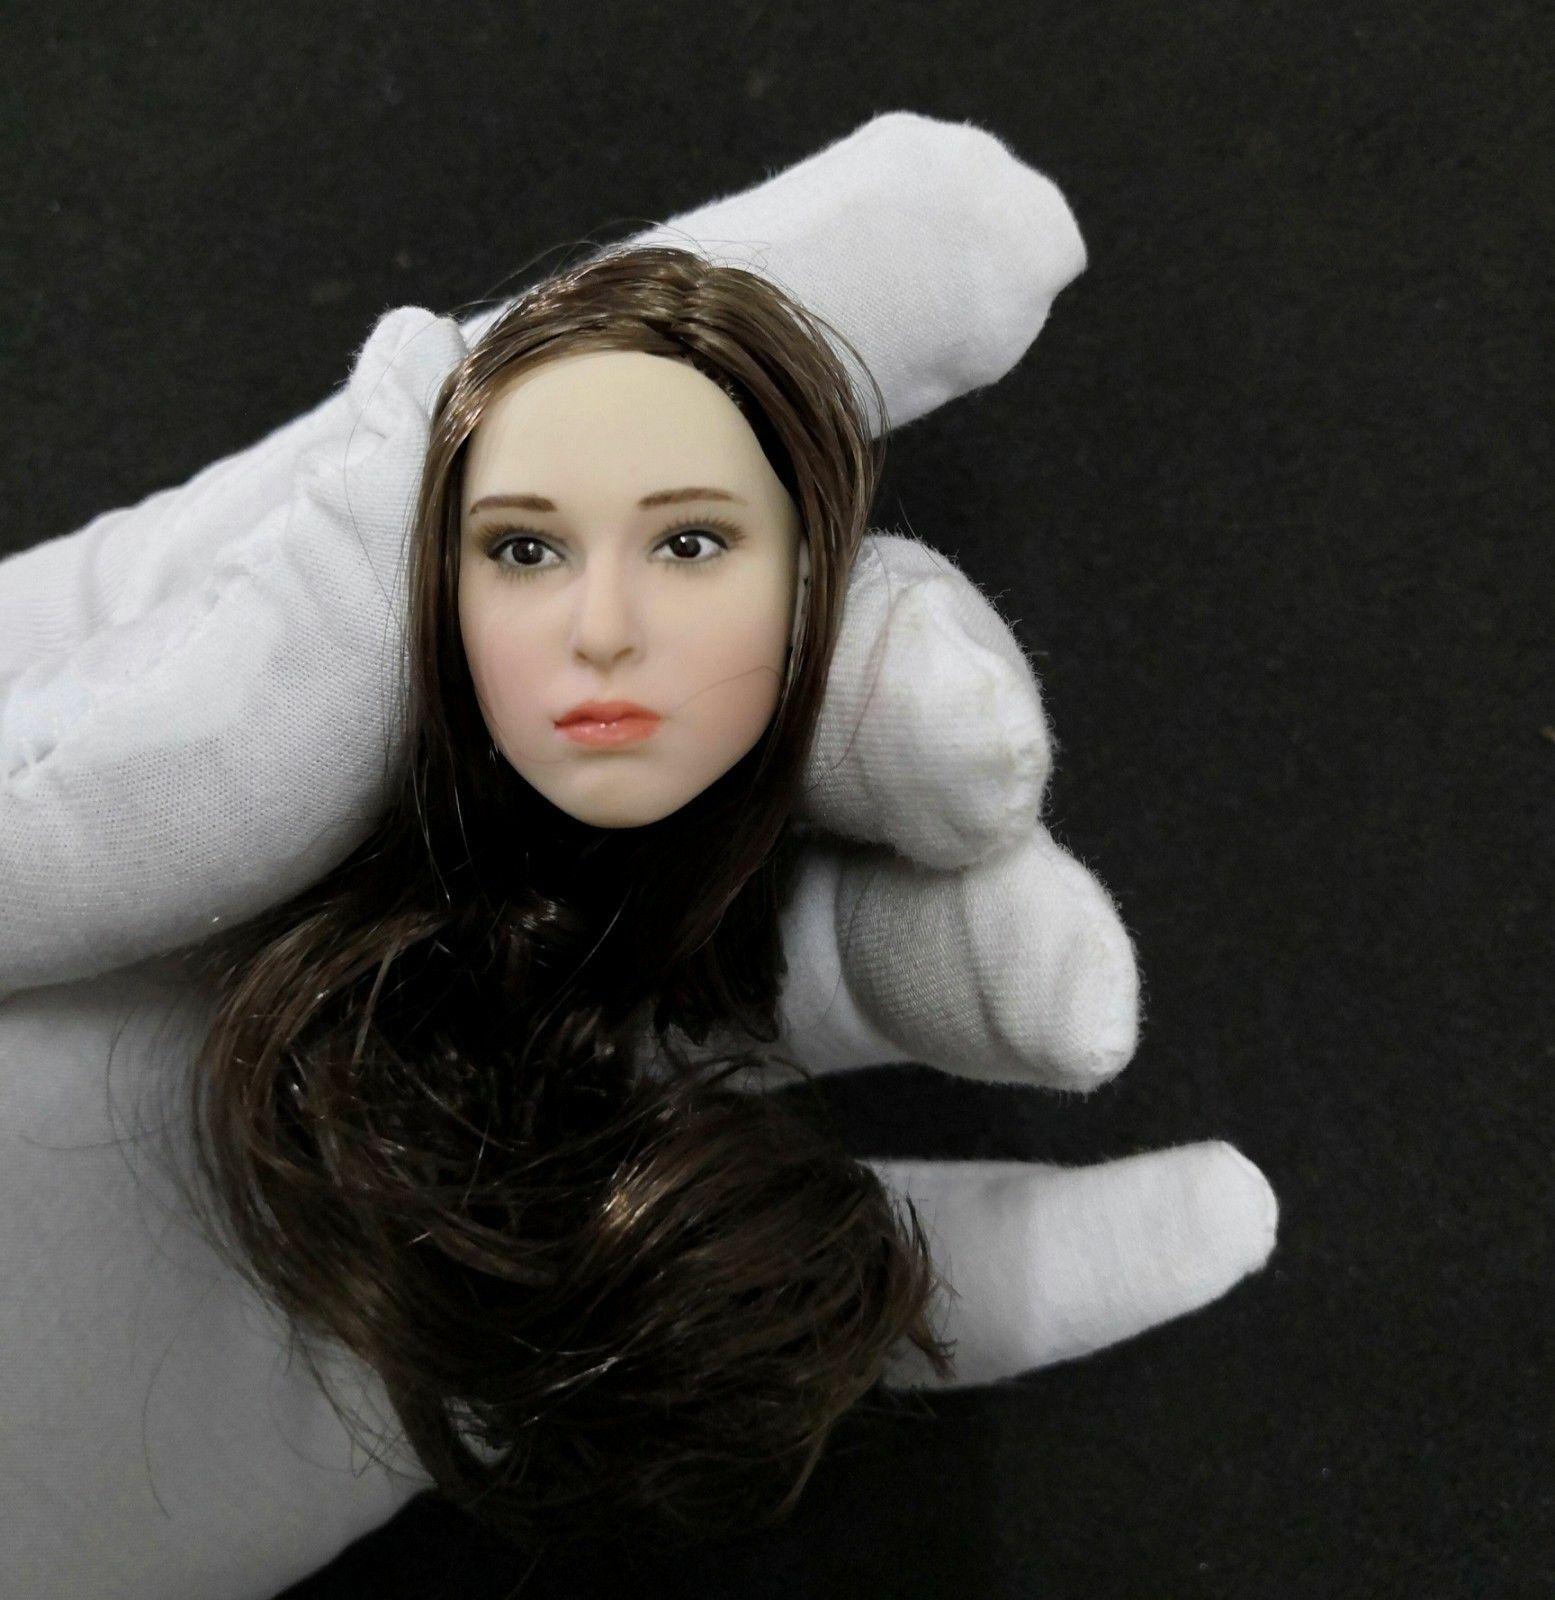 1 6 Female Natalie Portman Long Brown Hair Head Sculpt For PH 12'' Action Figure